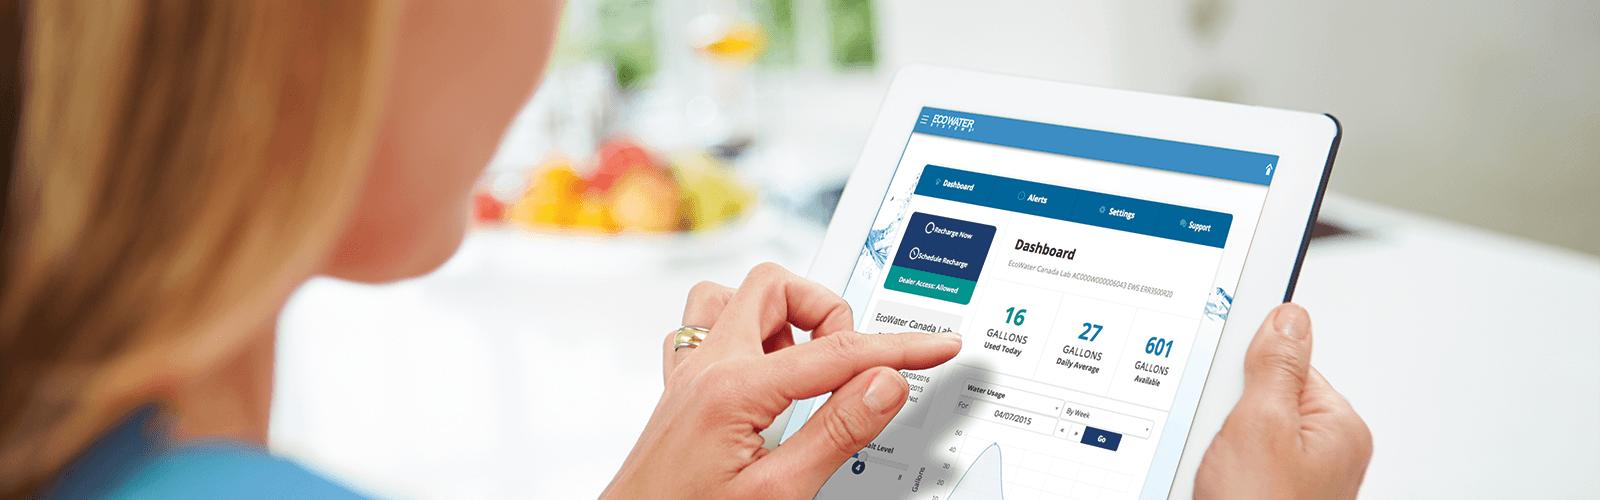 water monitoring app